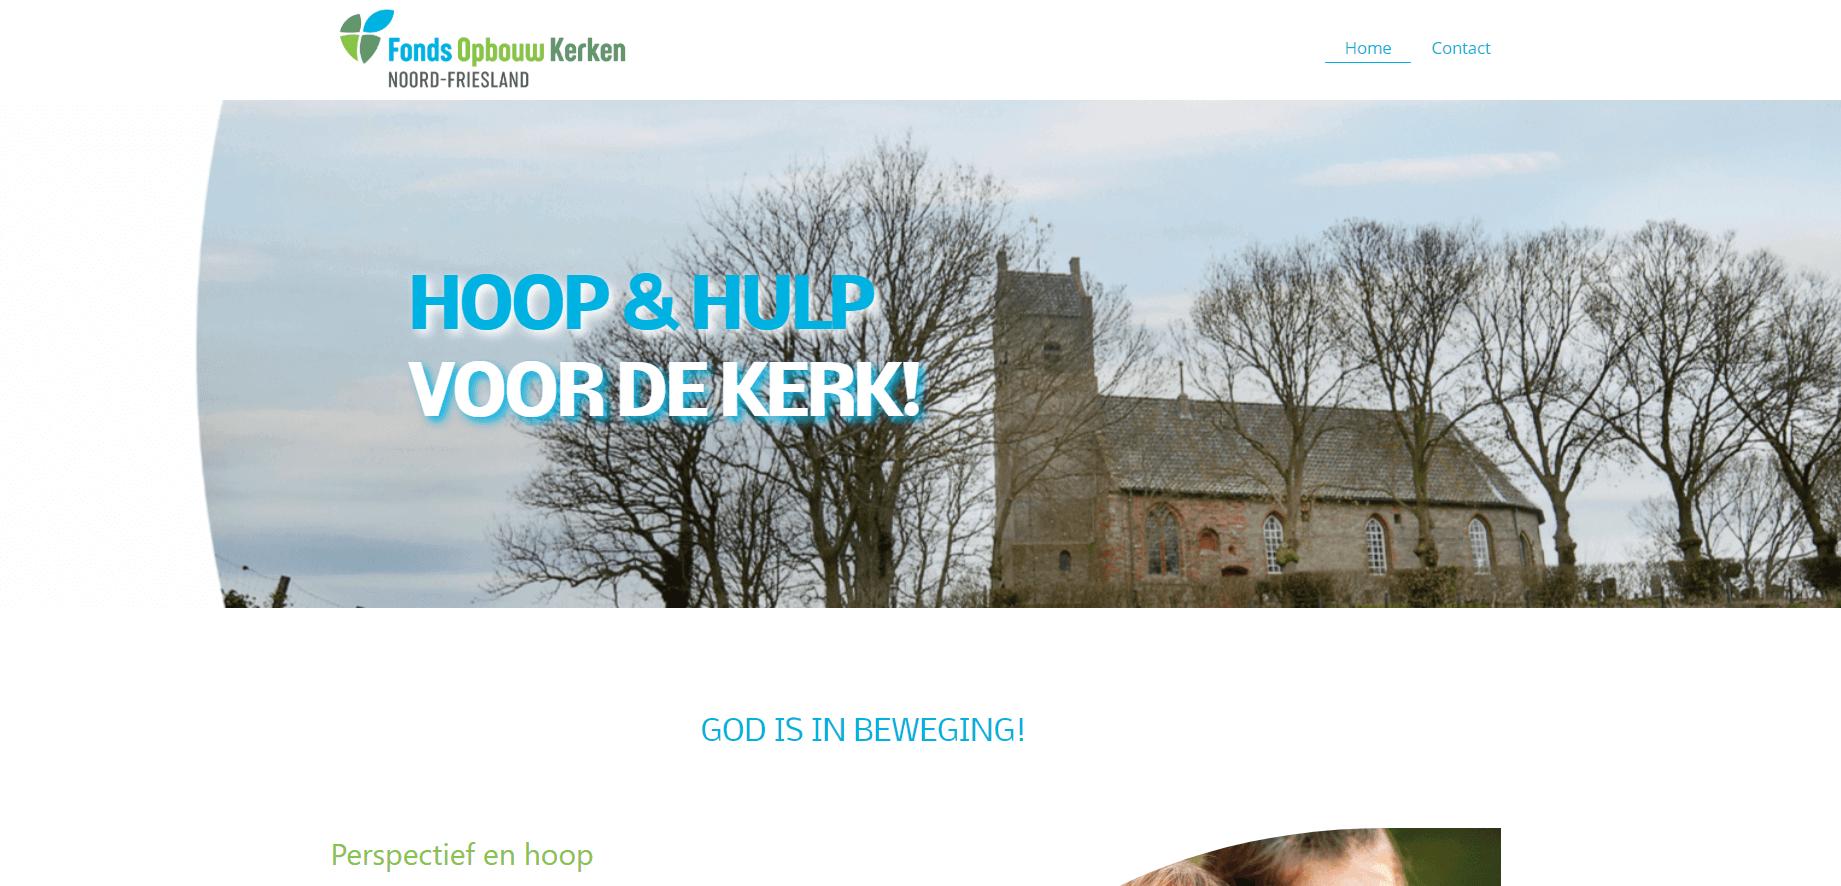 Fonds Opbouw Kerken Noord-Friesland - Doeltreffend Online